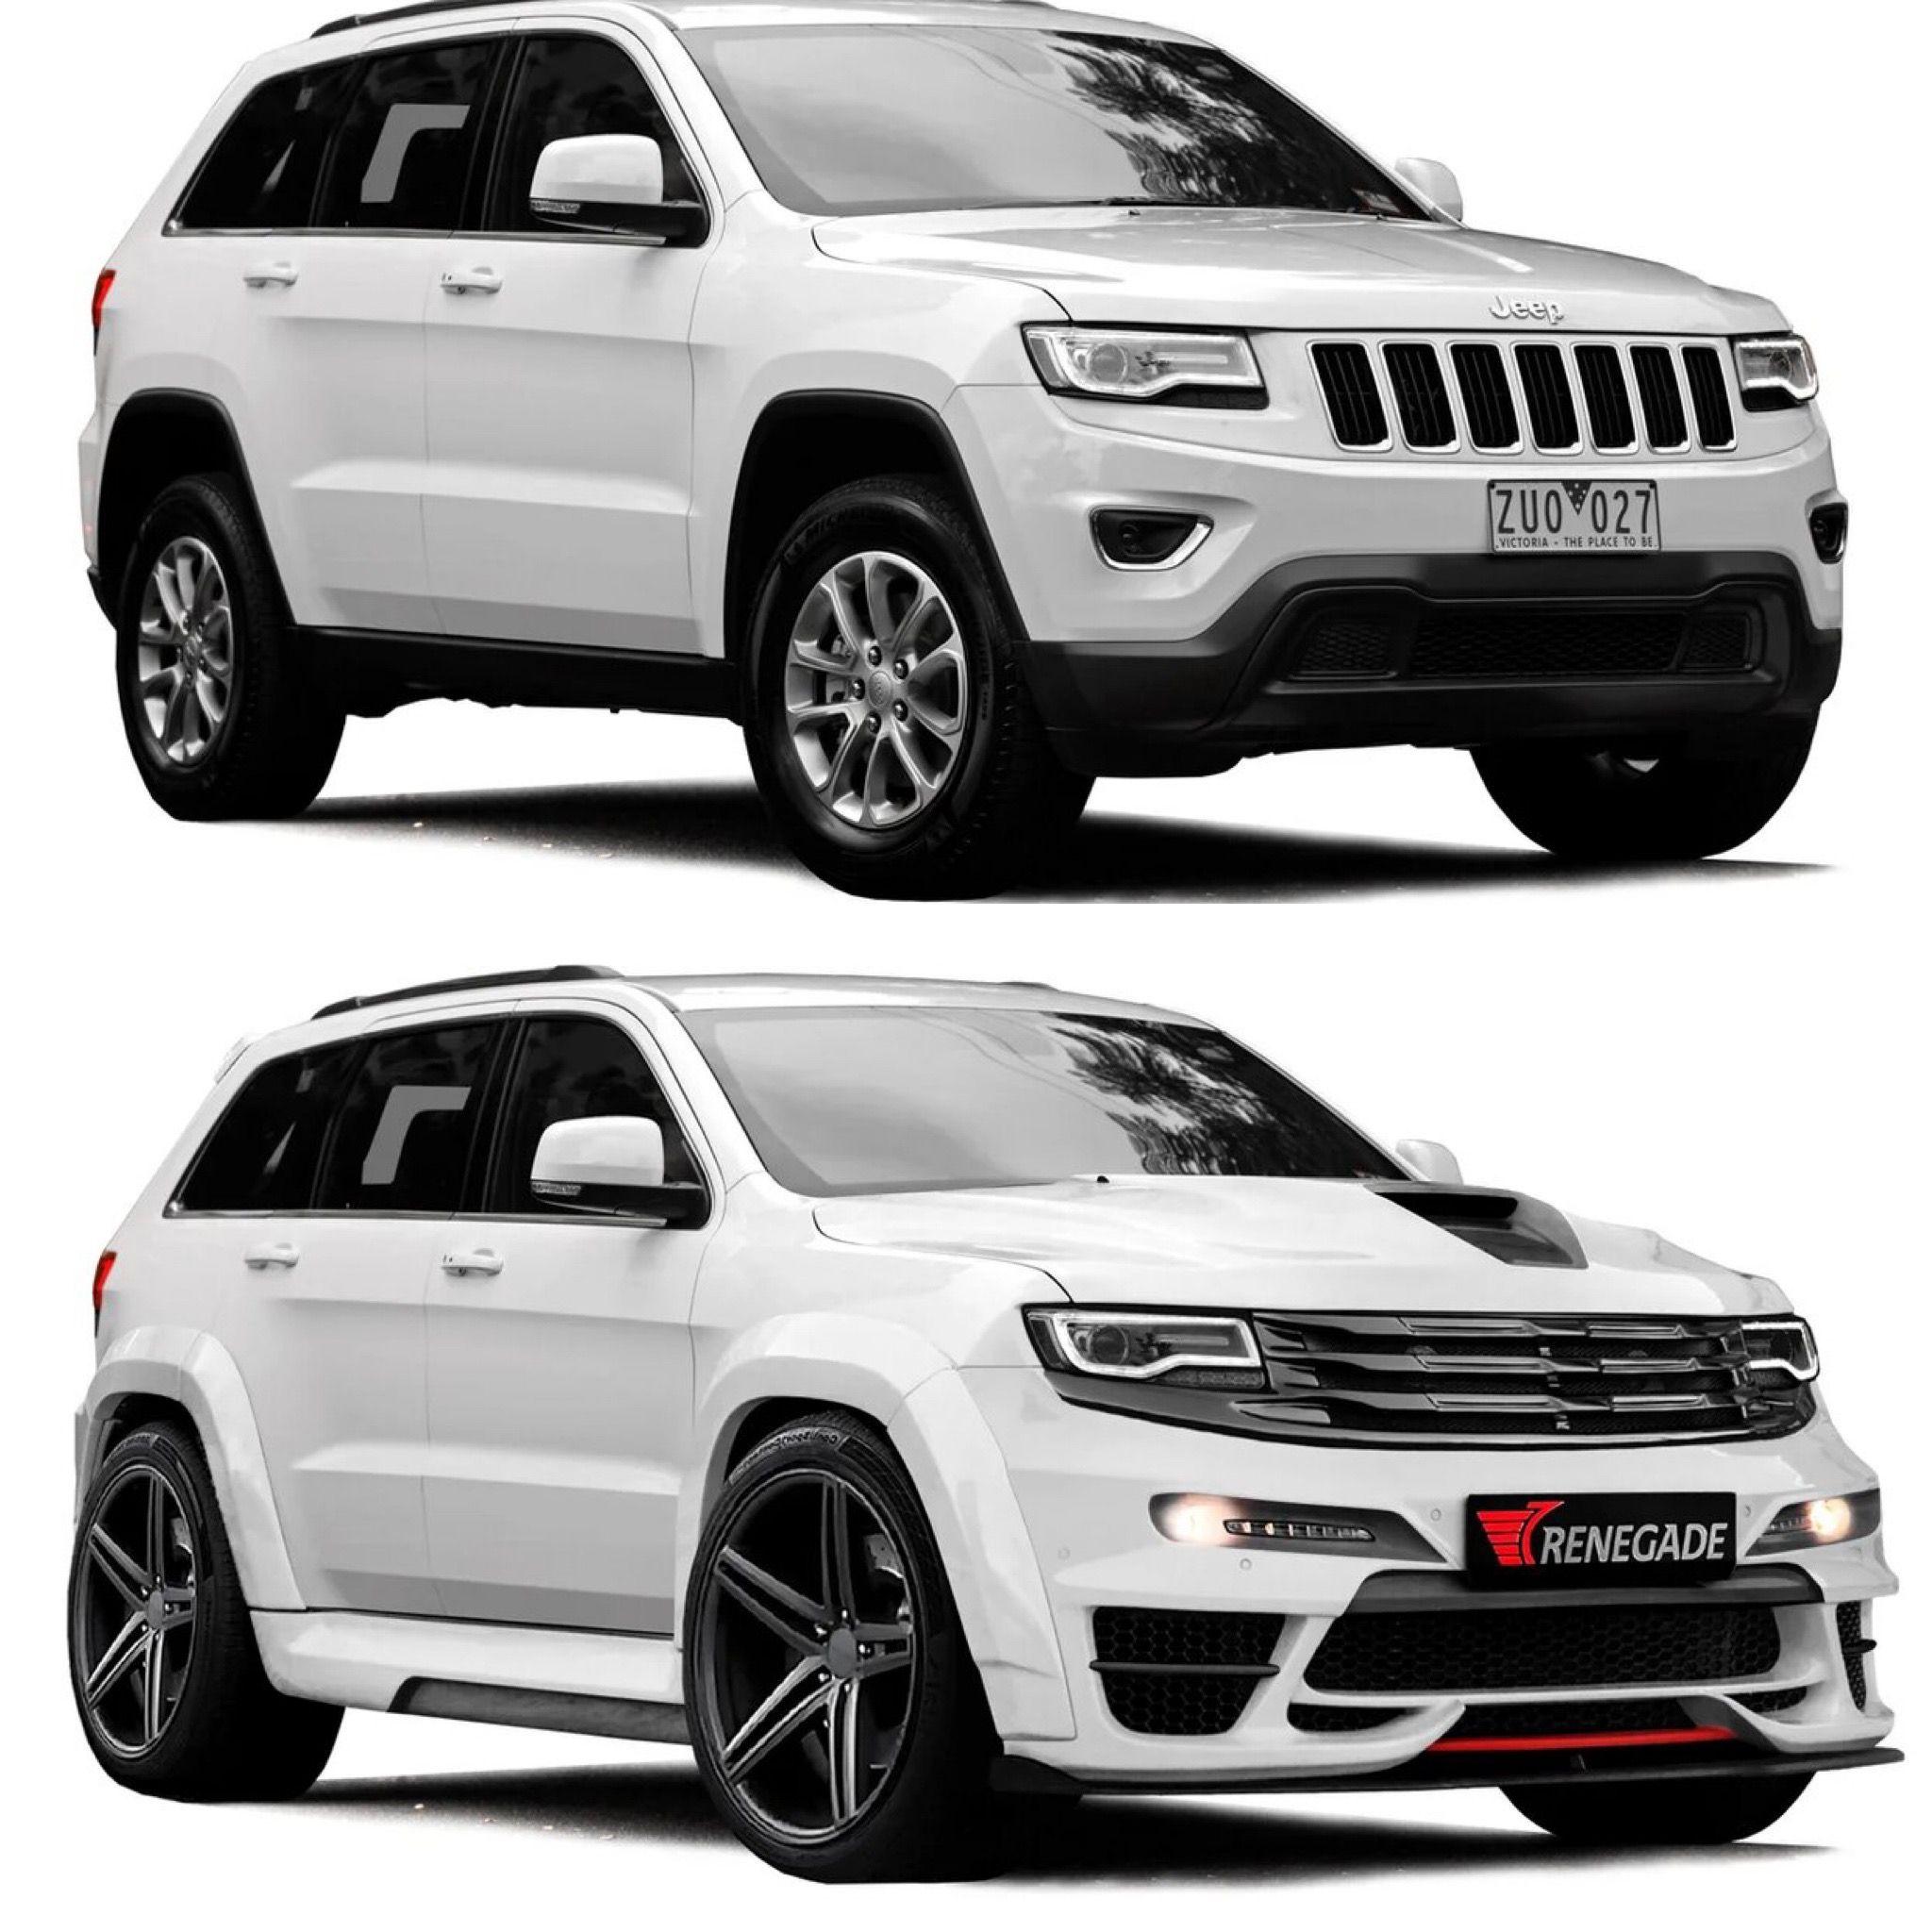 Tyrannos Body Kit V2 For Jeep Gc Wk2 Jeep Srt8 Jeep Grand Cherokee Srt Srt Jeep